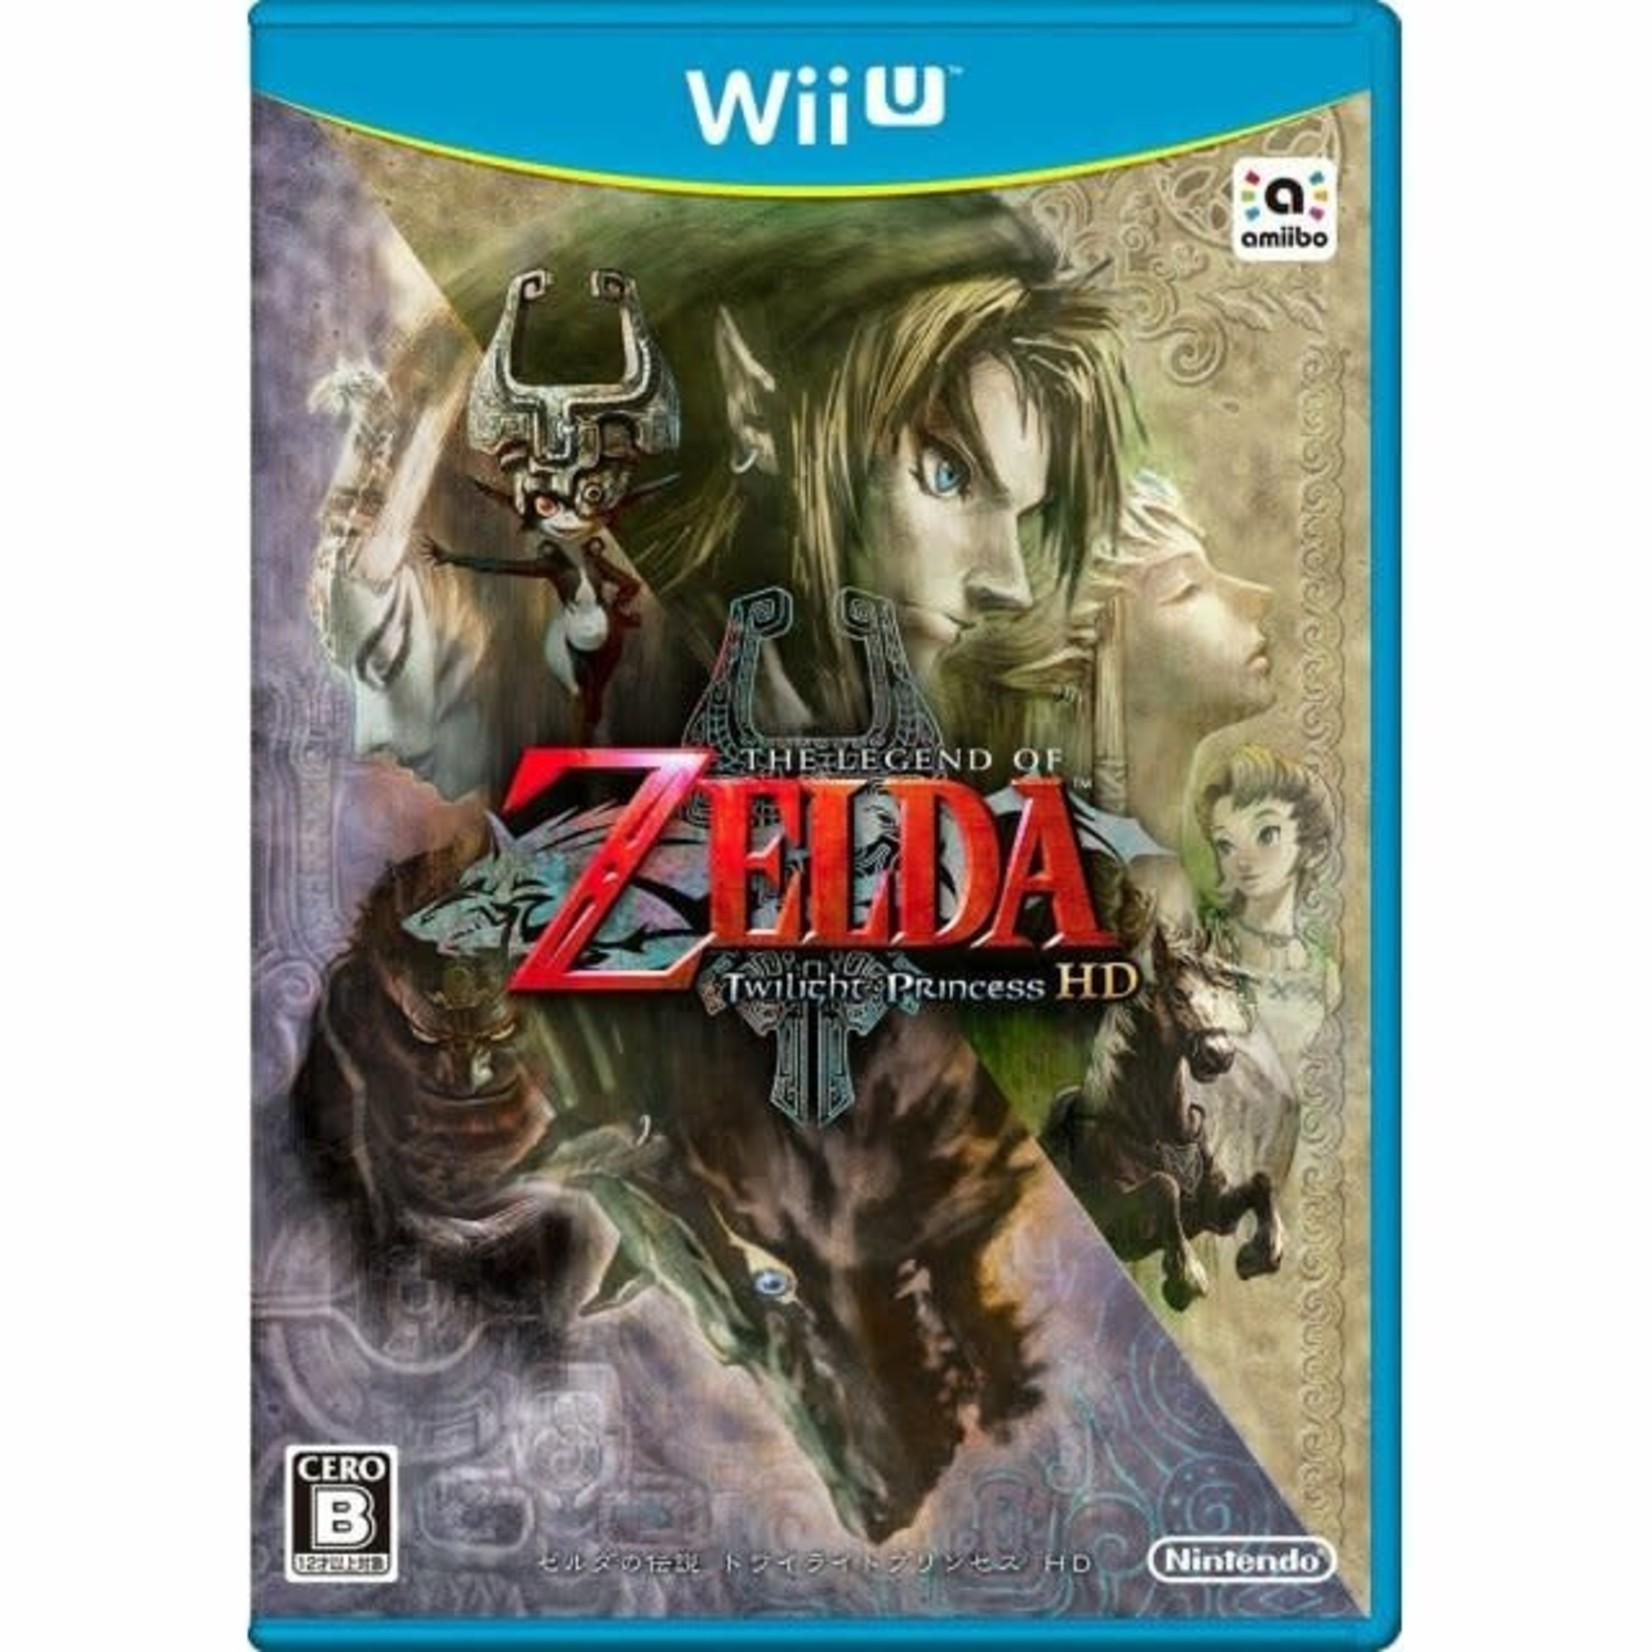 import-wiiu-The Legend of Zelda: Twilight Princess HD